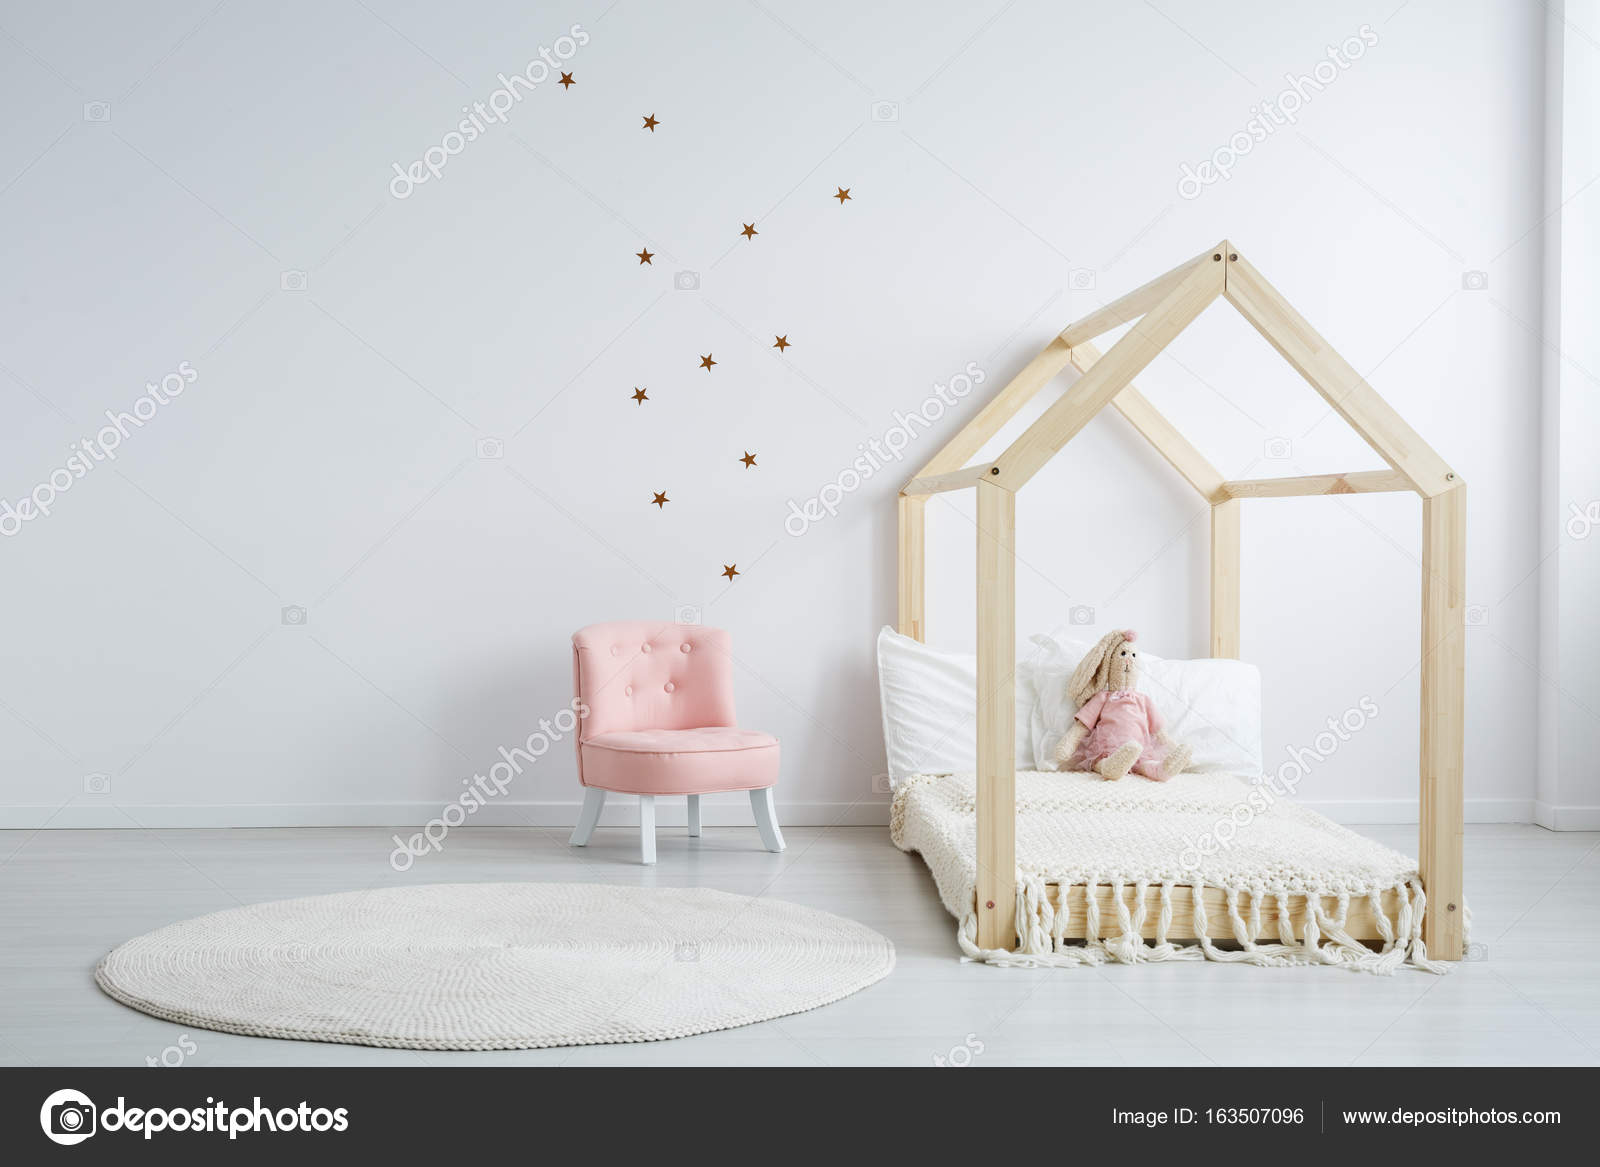 Moderne kindermöbel im schlafzimmer u2014 stockfoto © photographee.eu